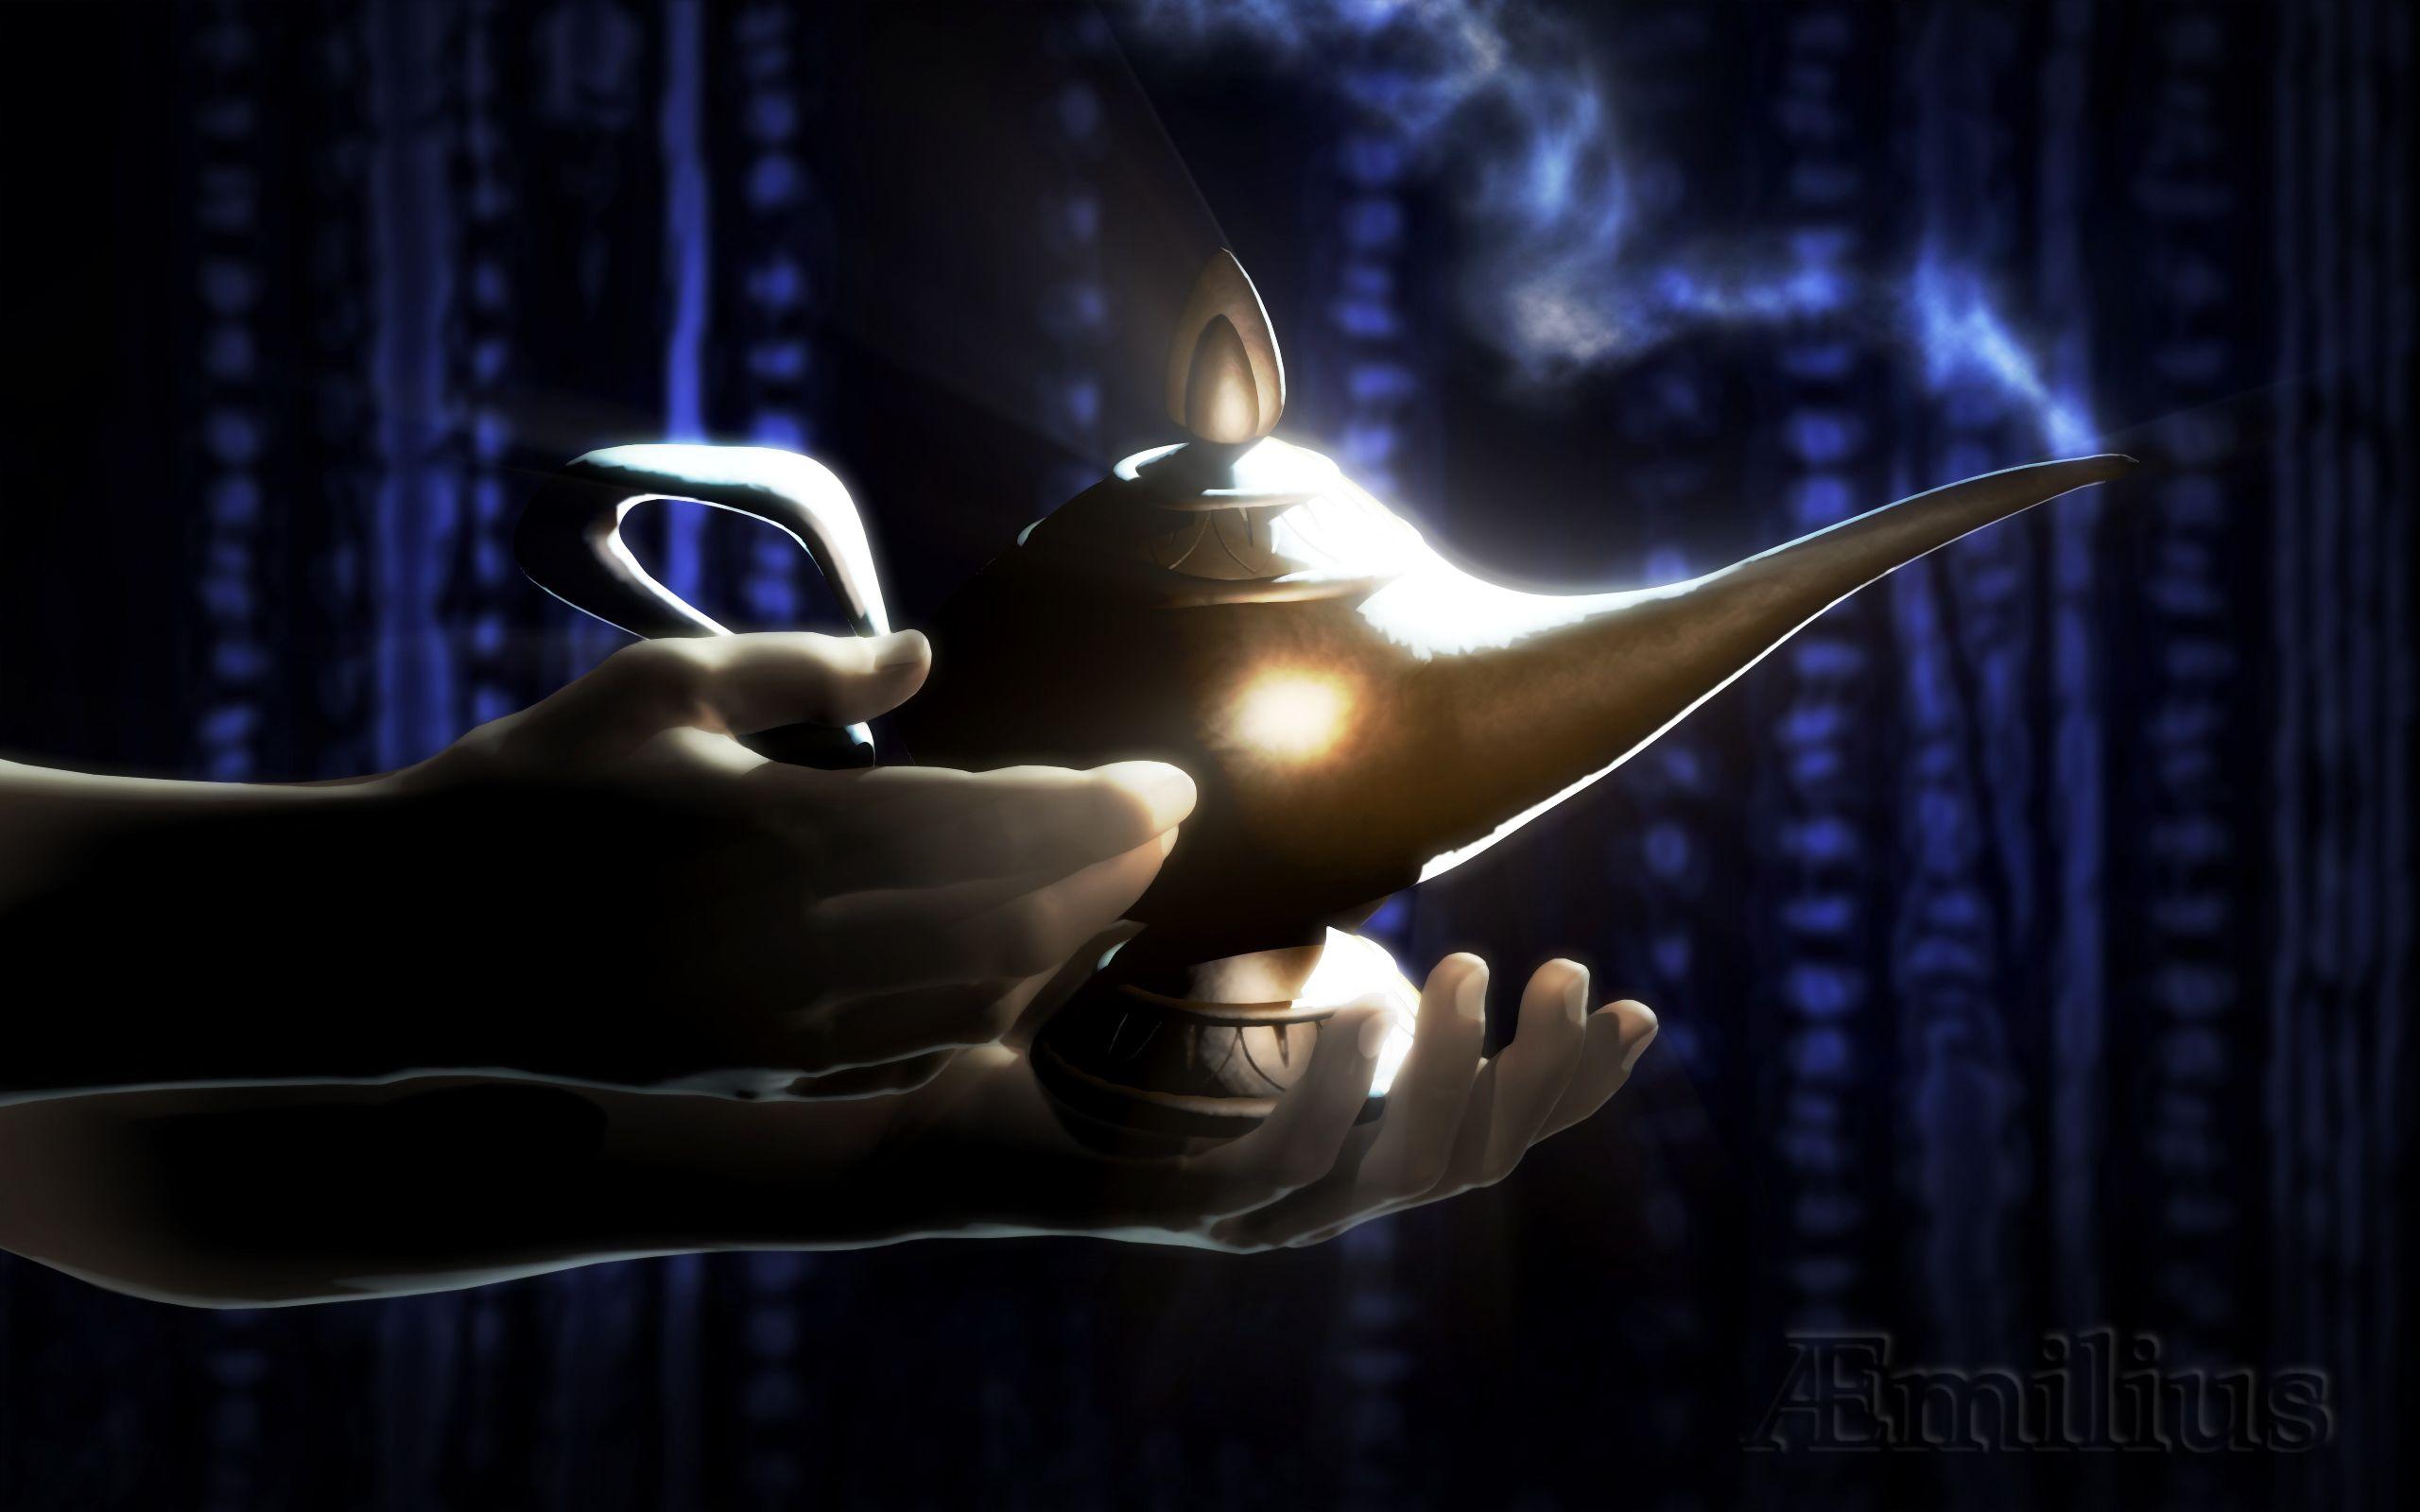 Explore Genie Lamp, Disney Magic, And More!